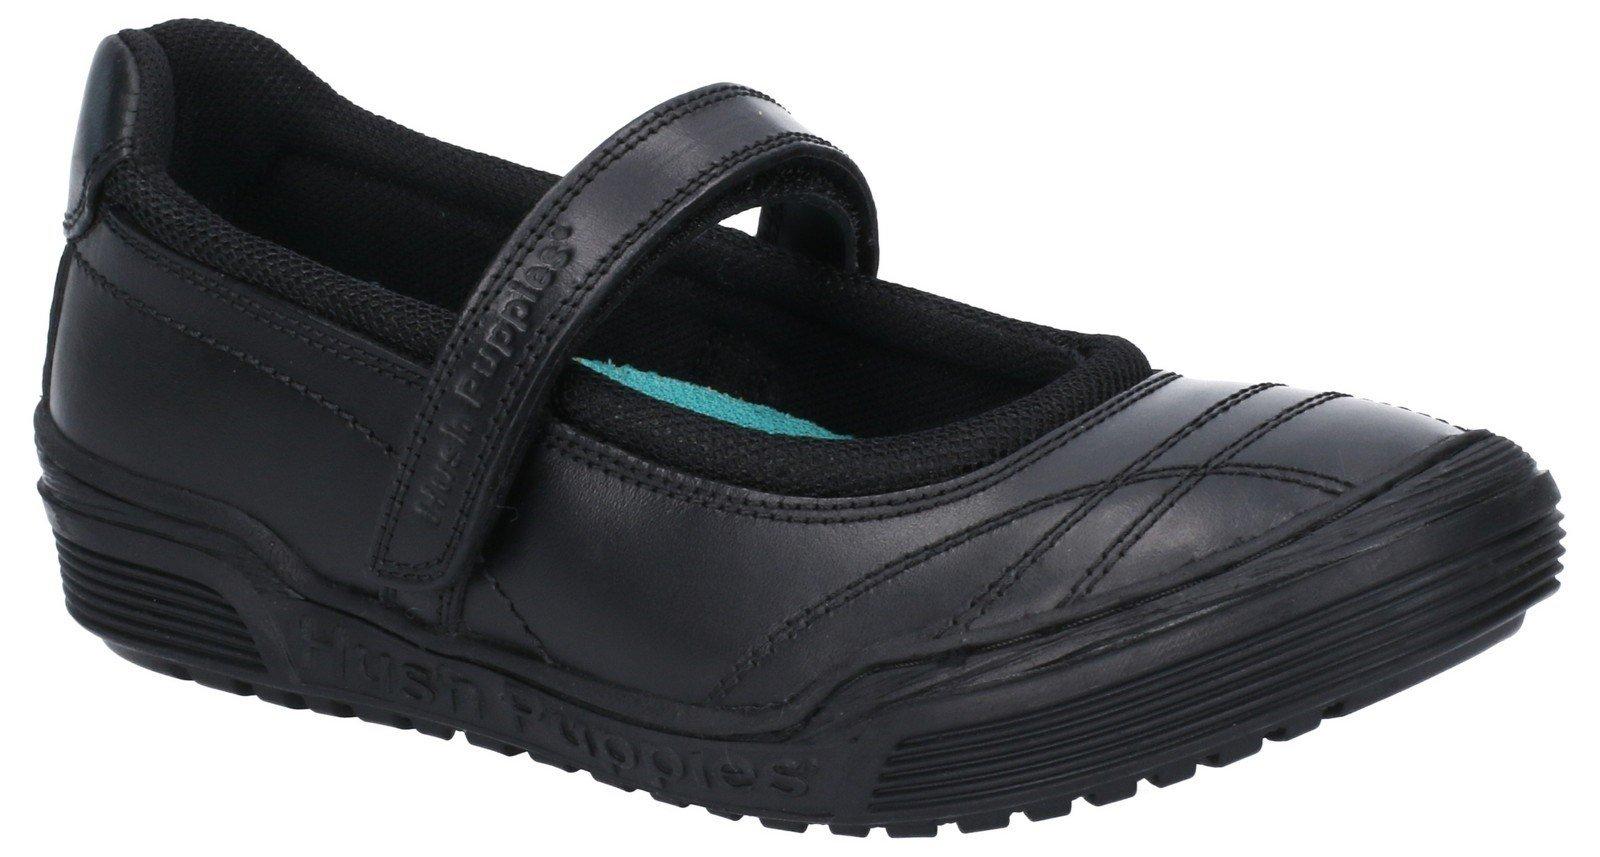 Hush Puppies Kid's Amelia Jnr Touch Fastening School Shoe Black 28975 - Black 10 UK